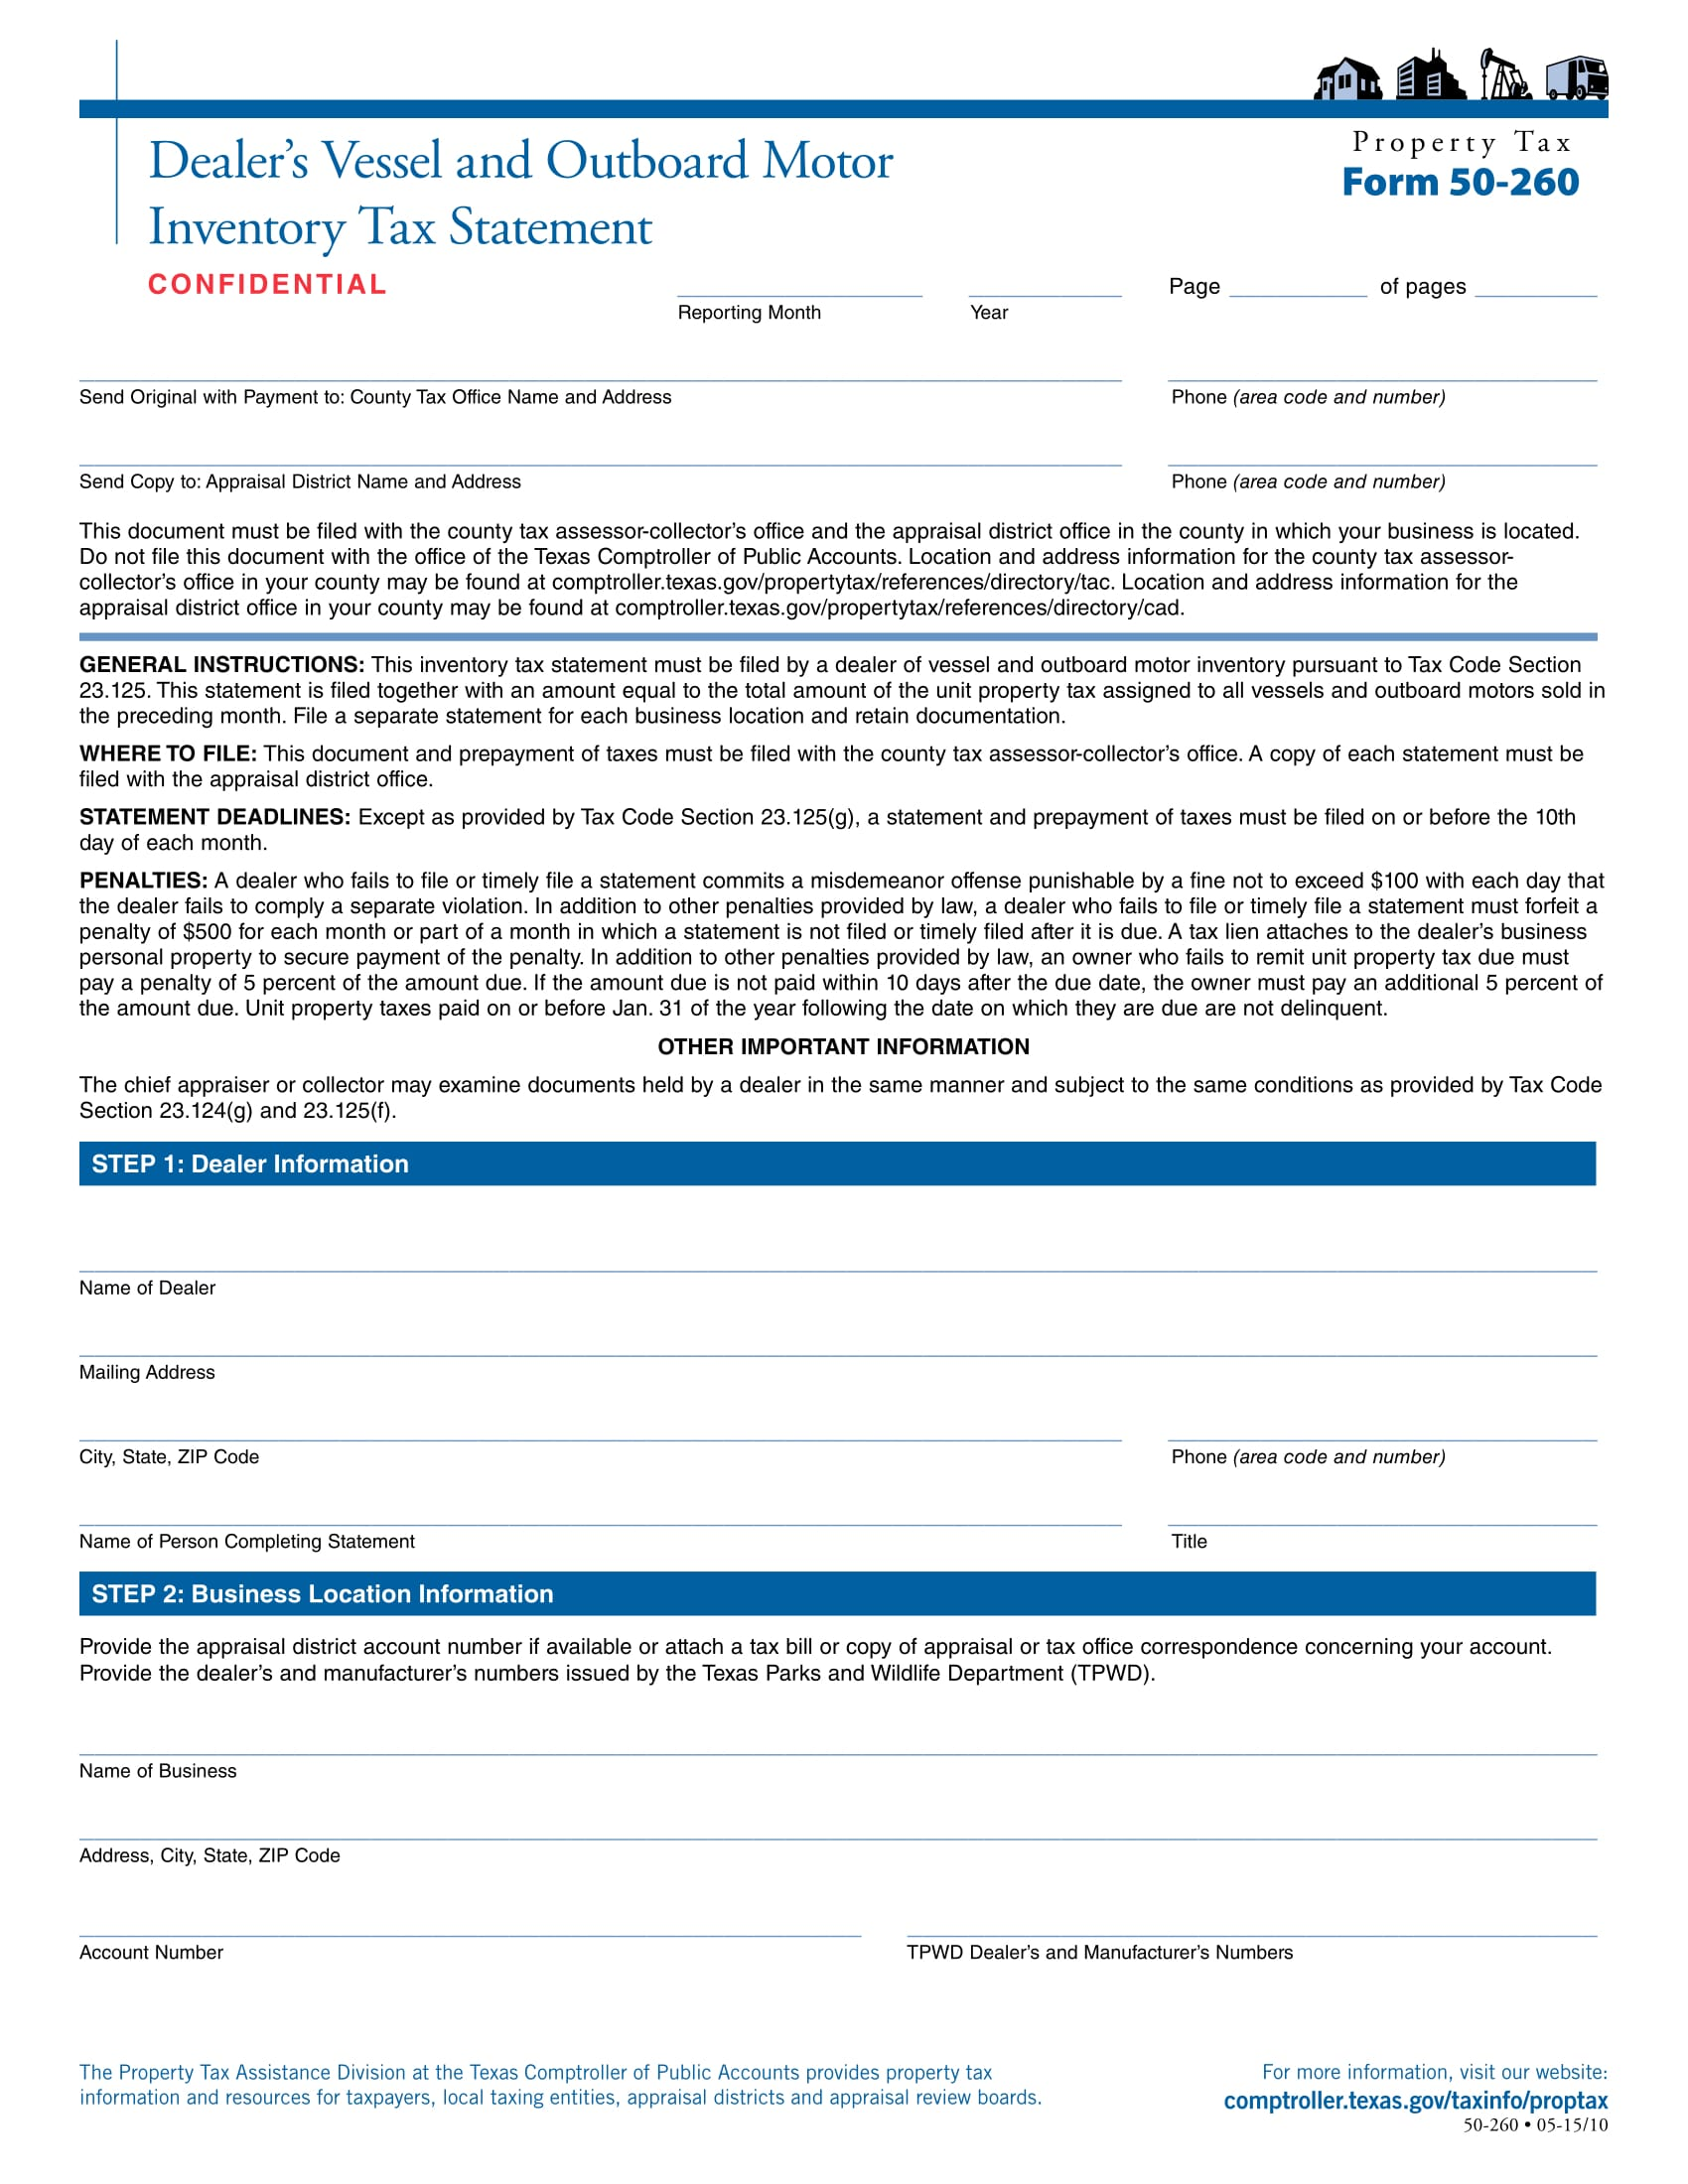 vessel inventory tax statement form 1